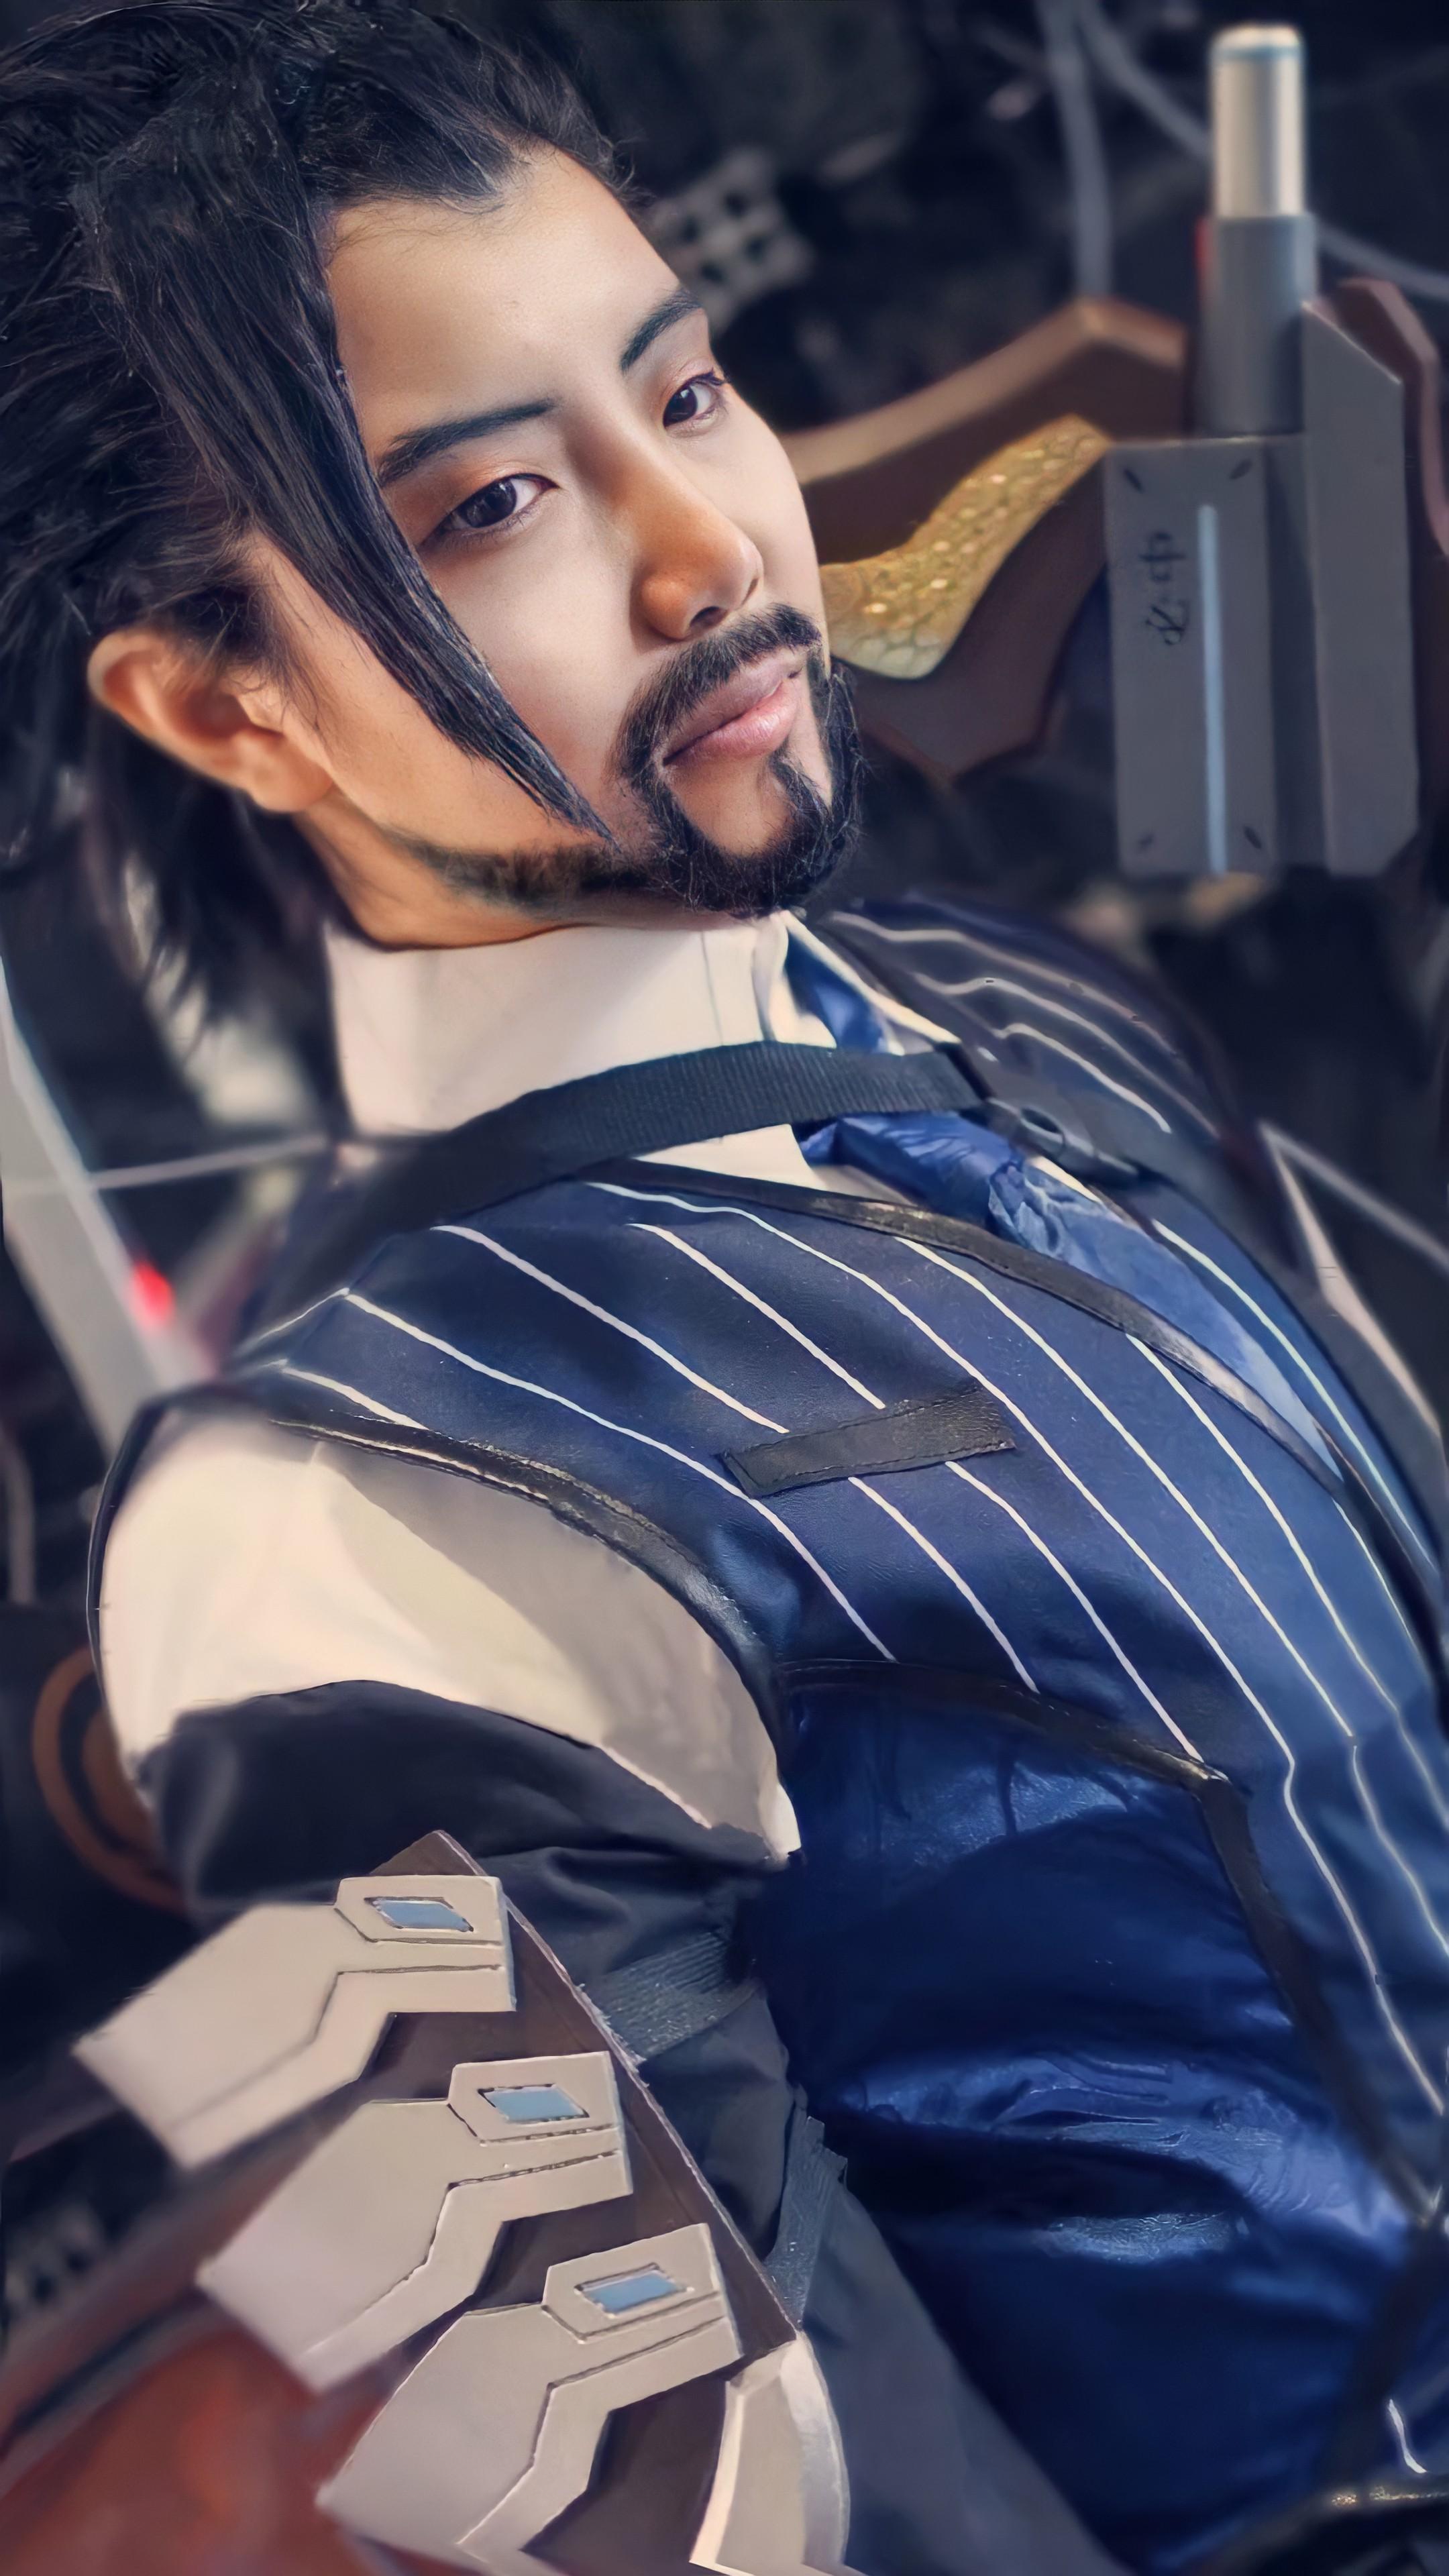 《JOJO的奇妙冒险》守望先锋cosplay【CN:瞎尸】-第4张